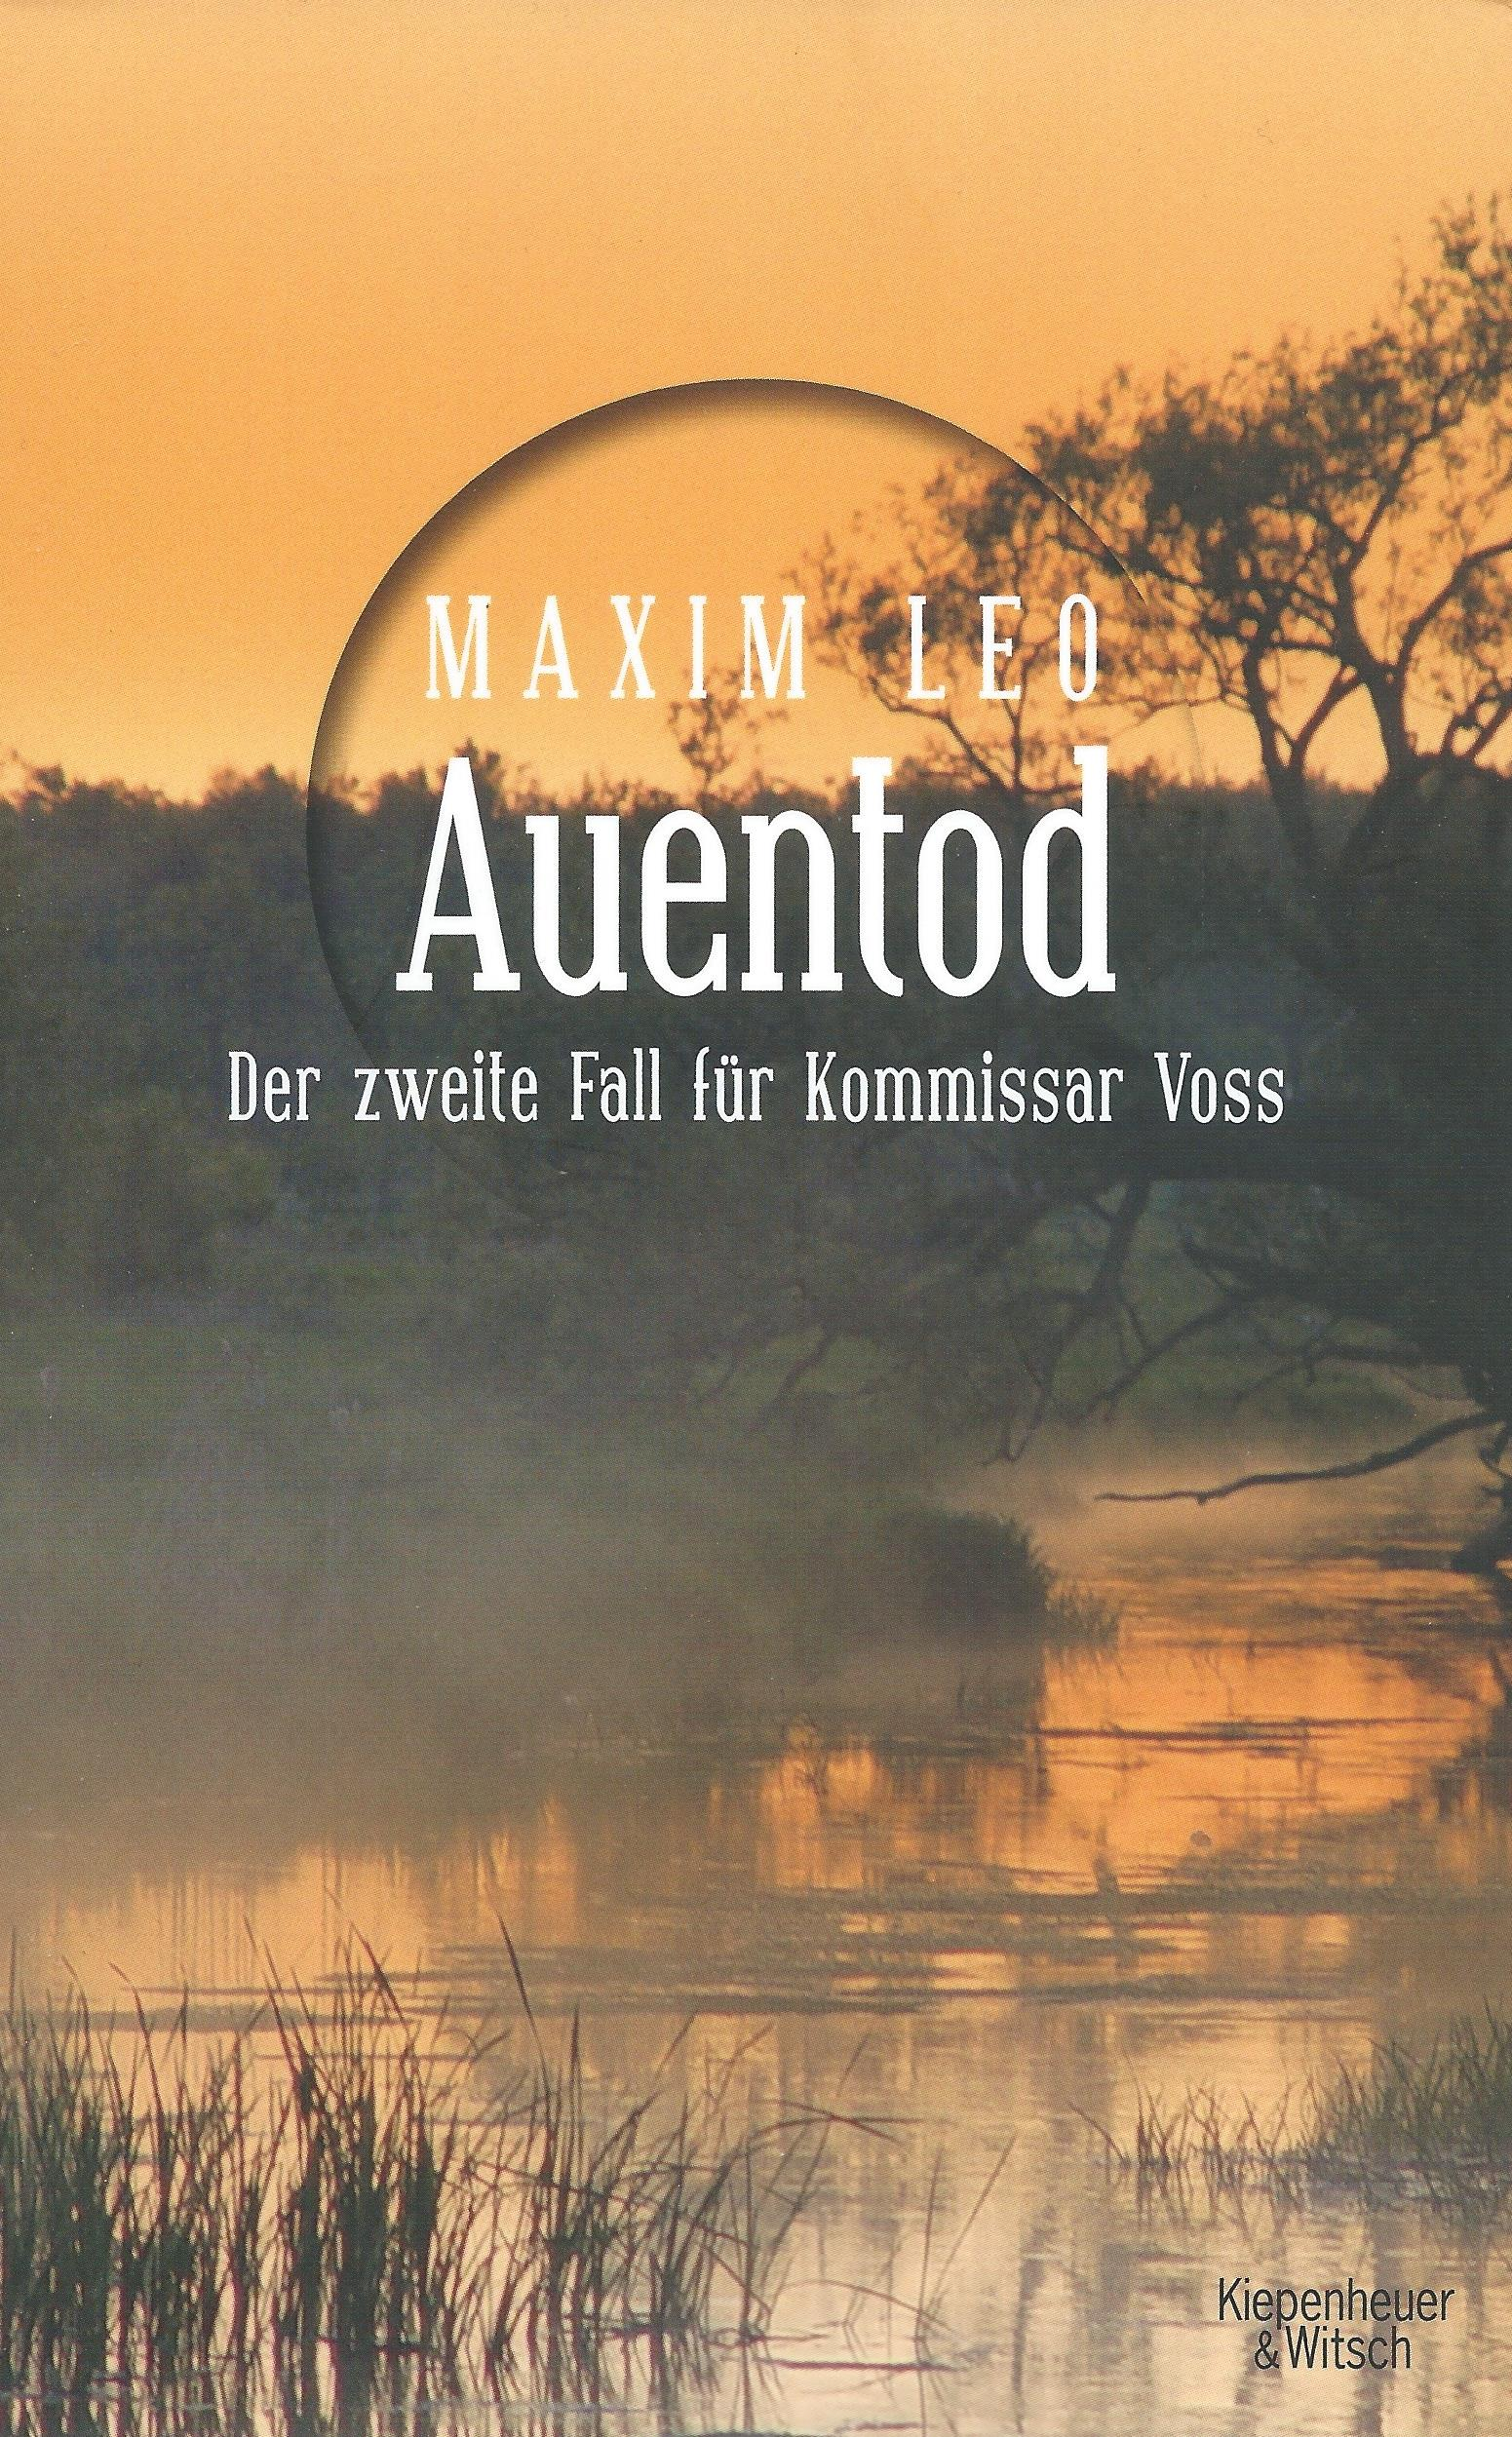 Maxim Leo: Auentod